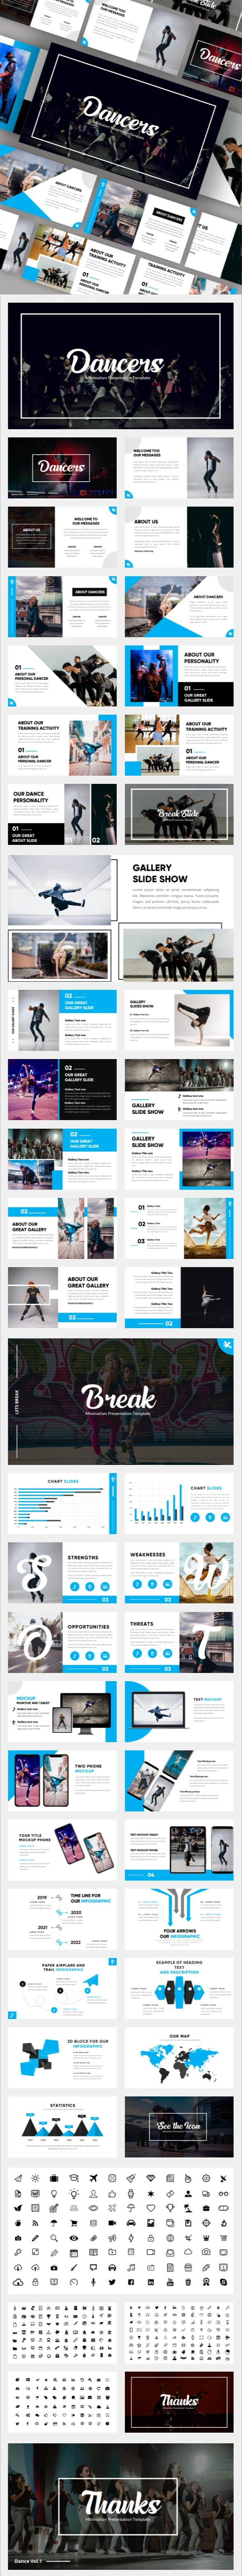 Dancers - Minimalism Dance Powerpoint Template - Miscellaneous PowerPoint Templates